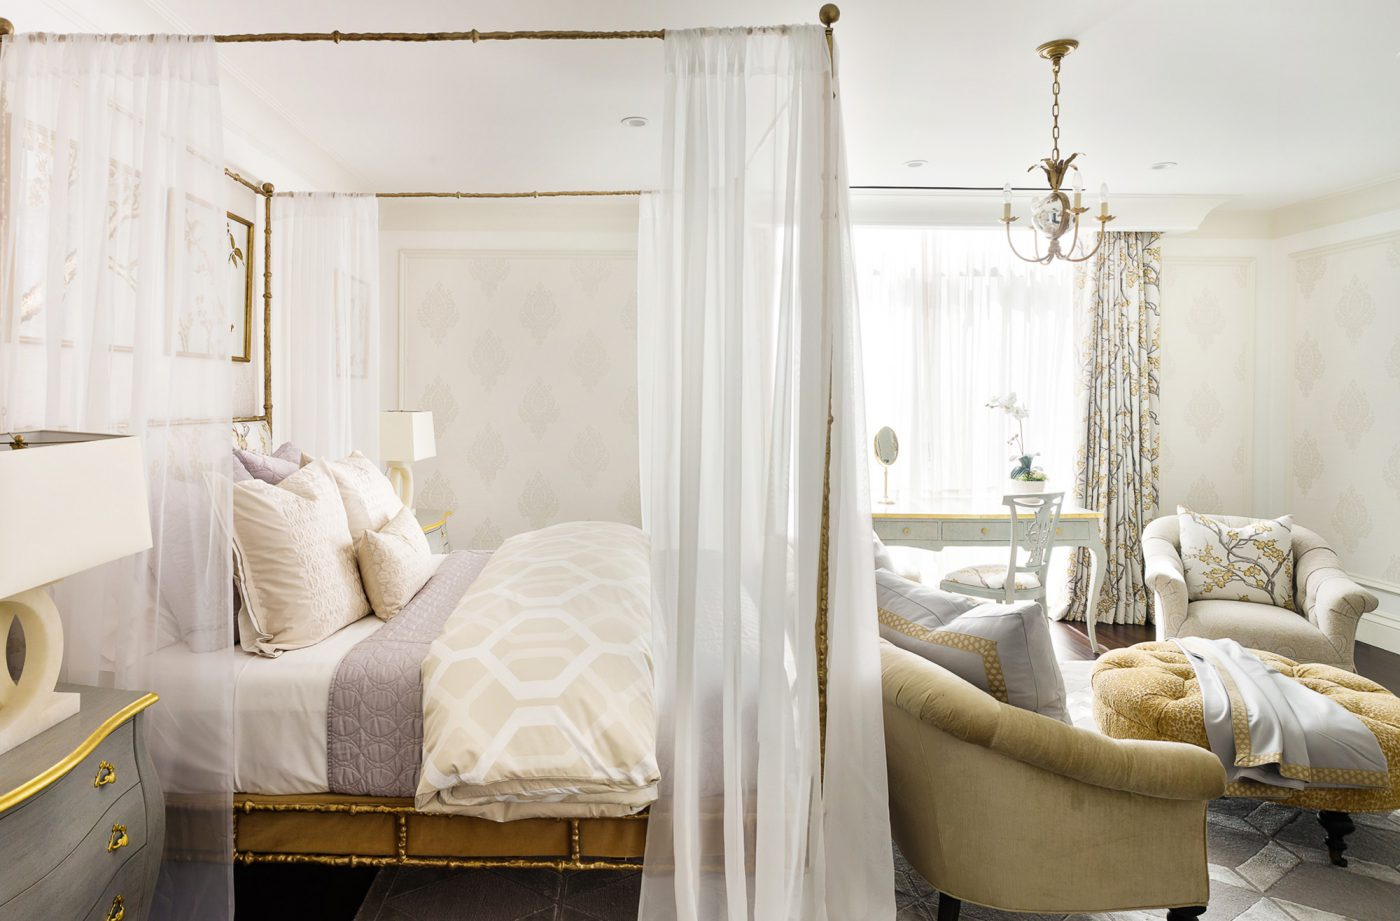 French Inspired Bedroom & Bath - Tara Dudley Interiors | Las ...